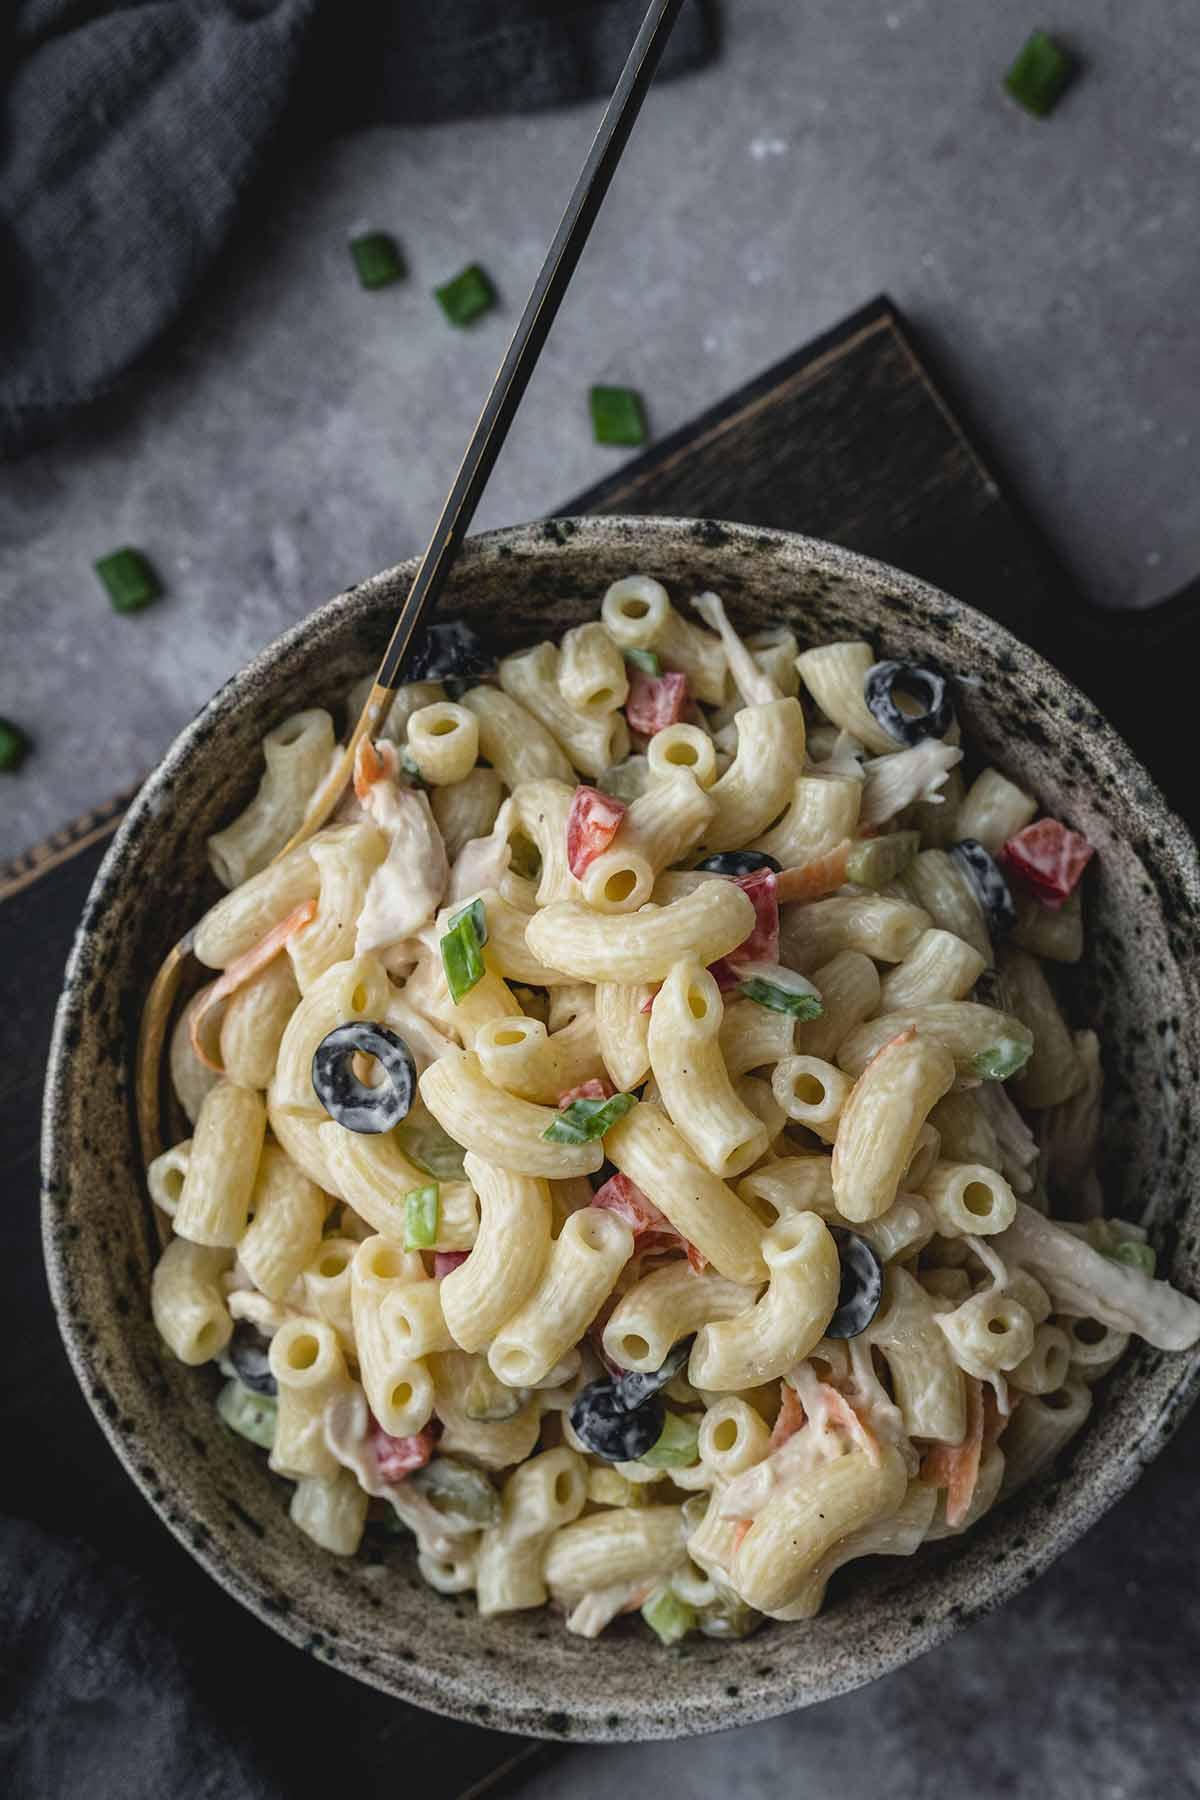 Pasta Salad Recipes With Chicken